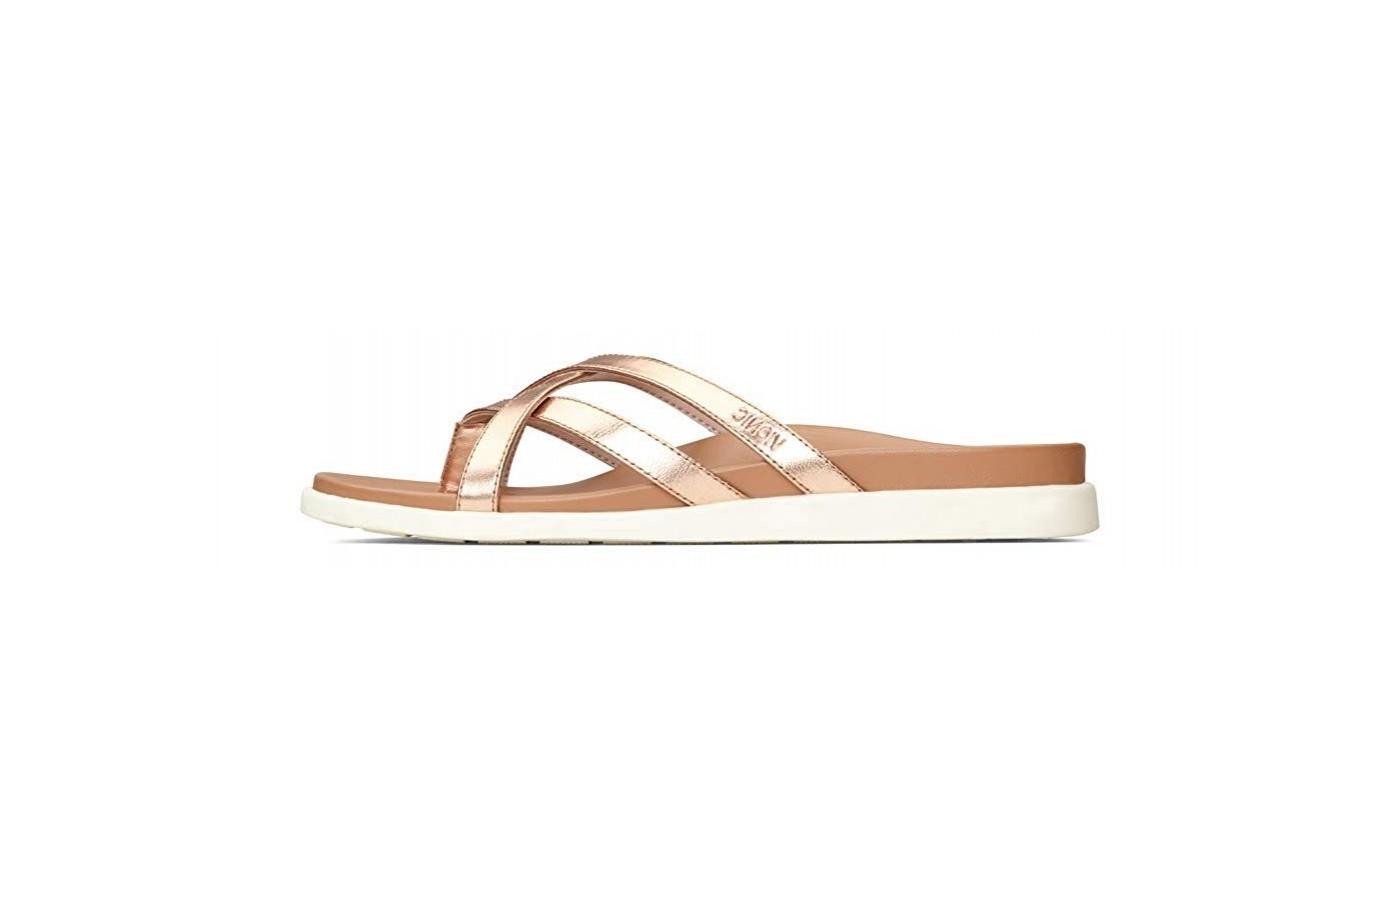 Vionic Palm Daisy sandal left side